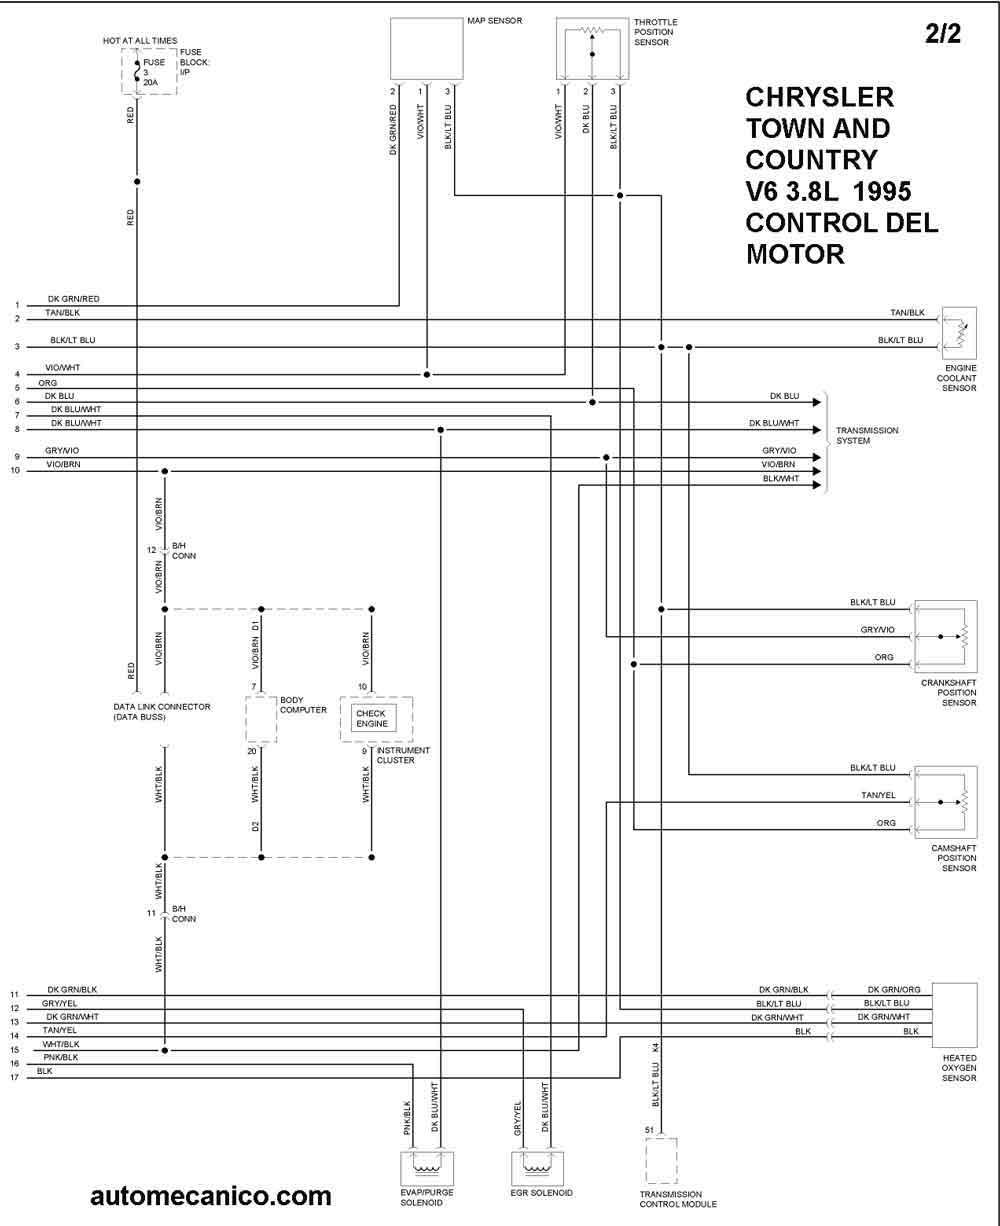 CHRYSLER 1995 Diagramas control del motor Graphics